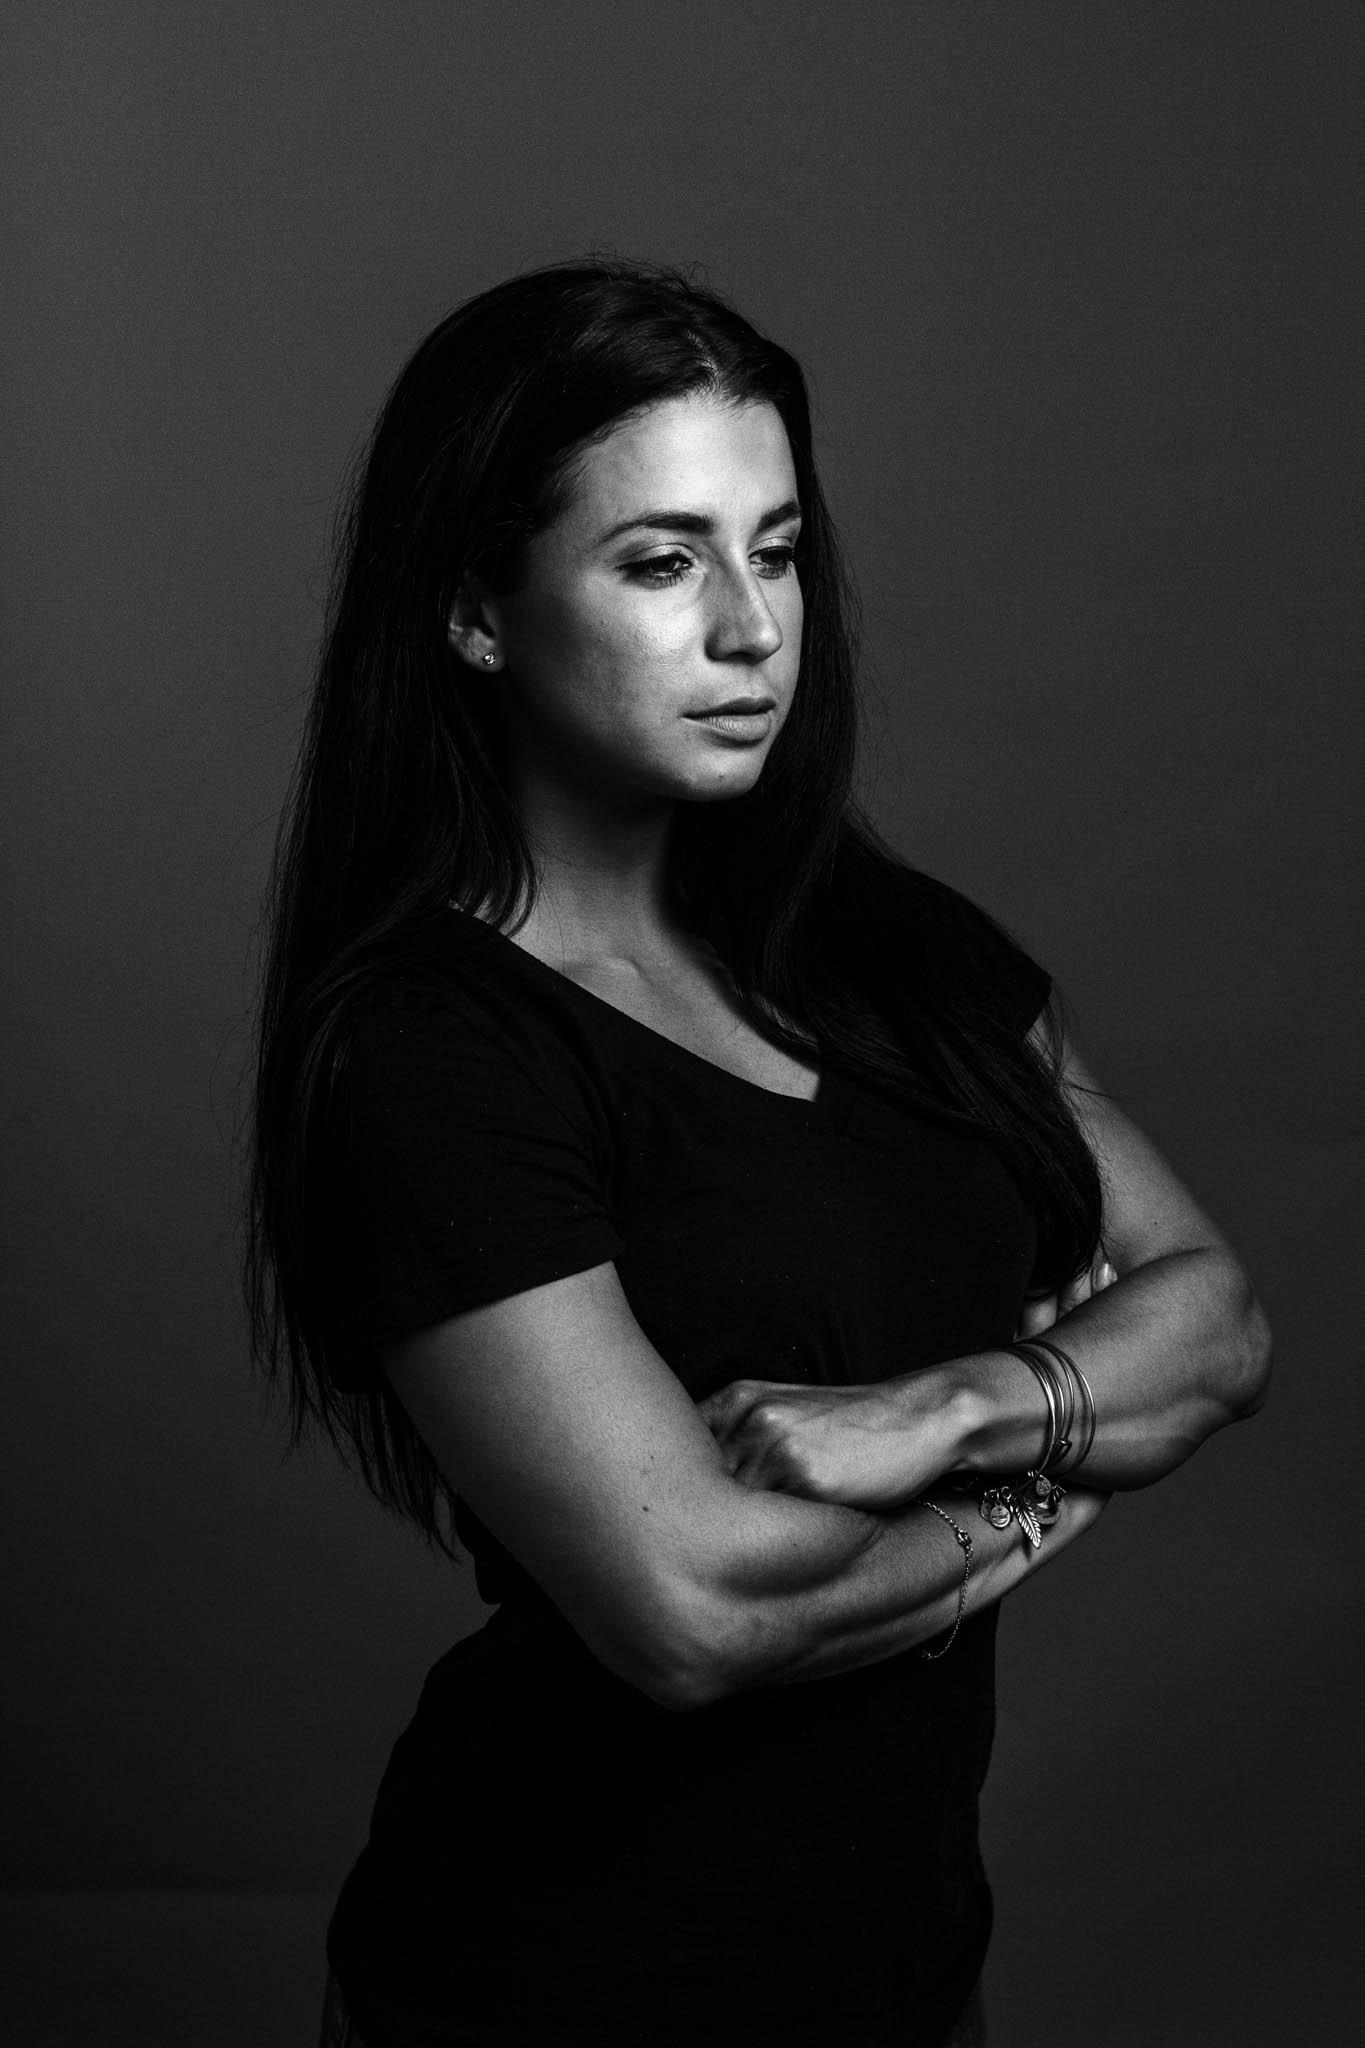 Lauren Nanni by Thomas Sawyer